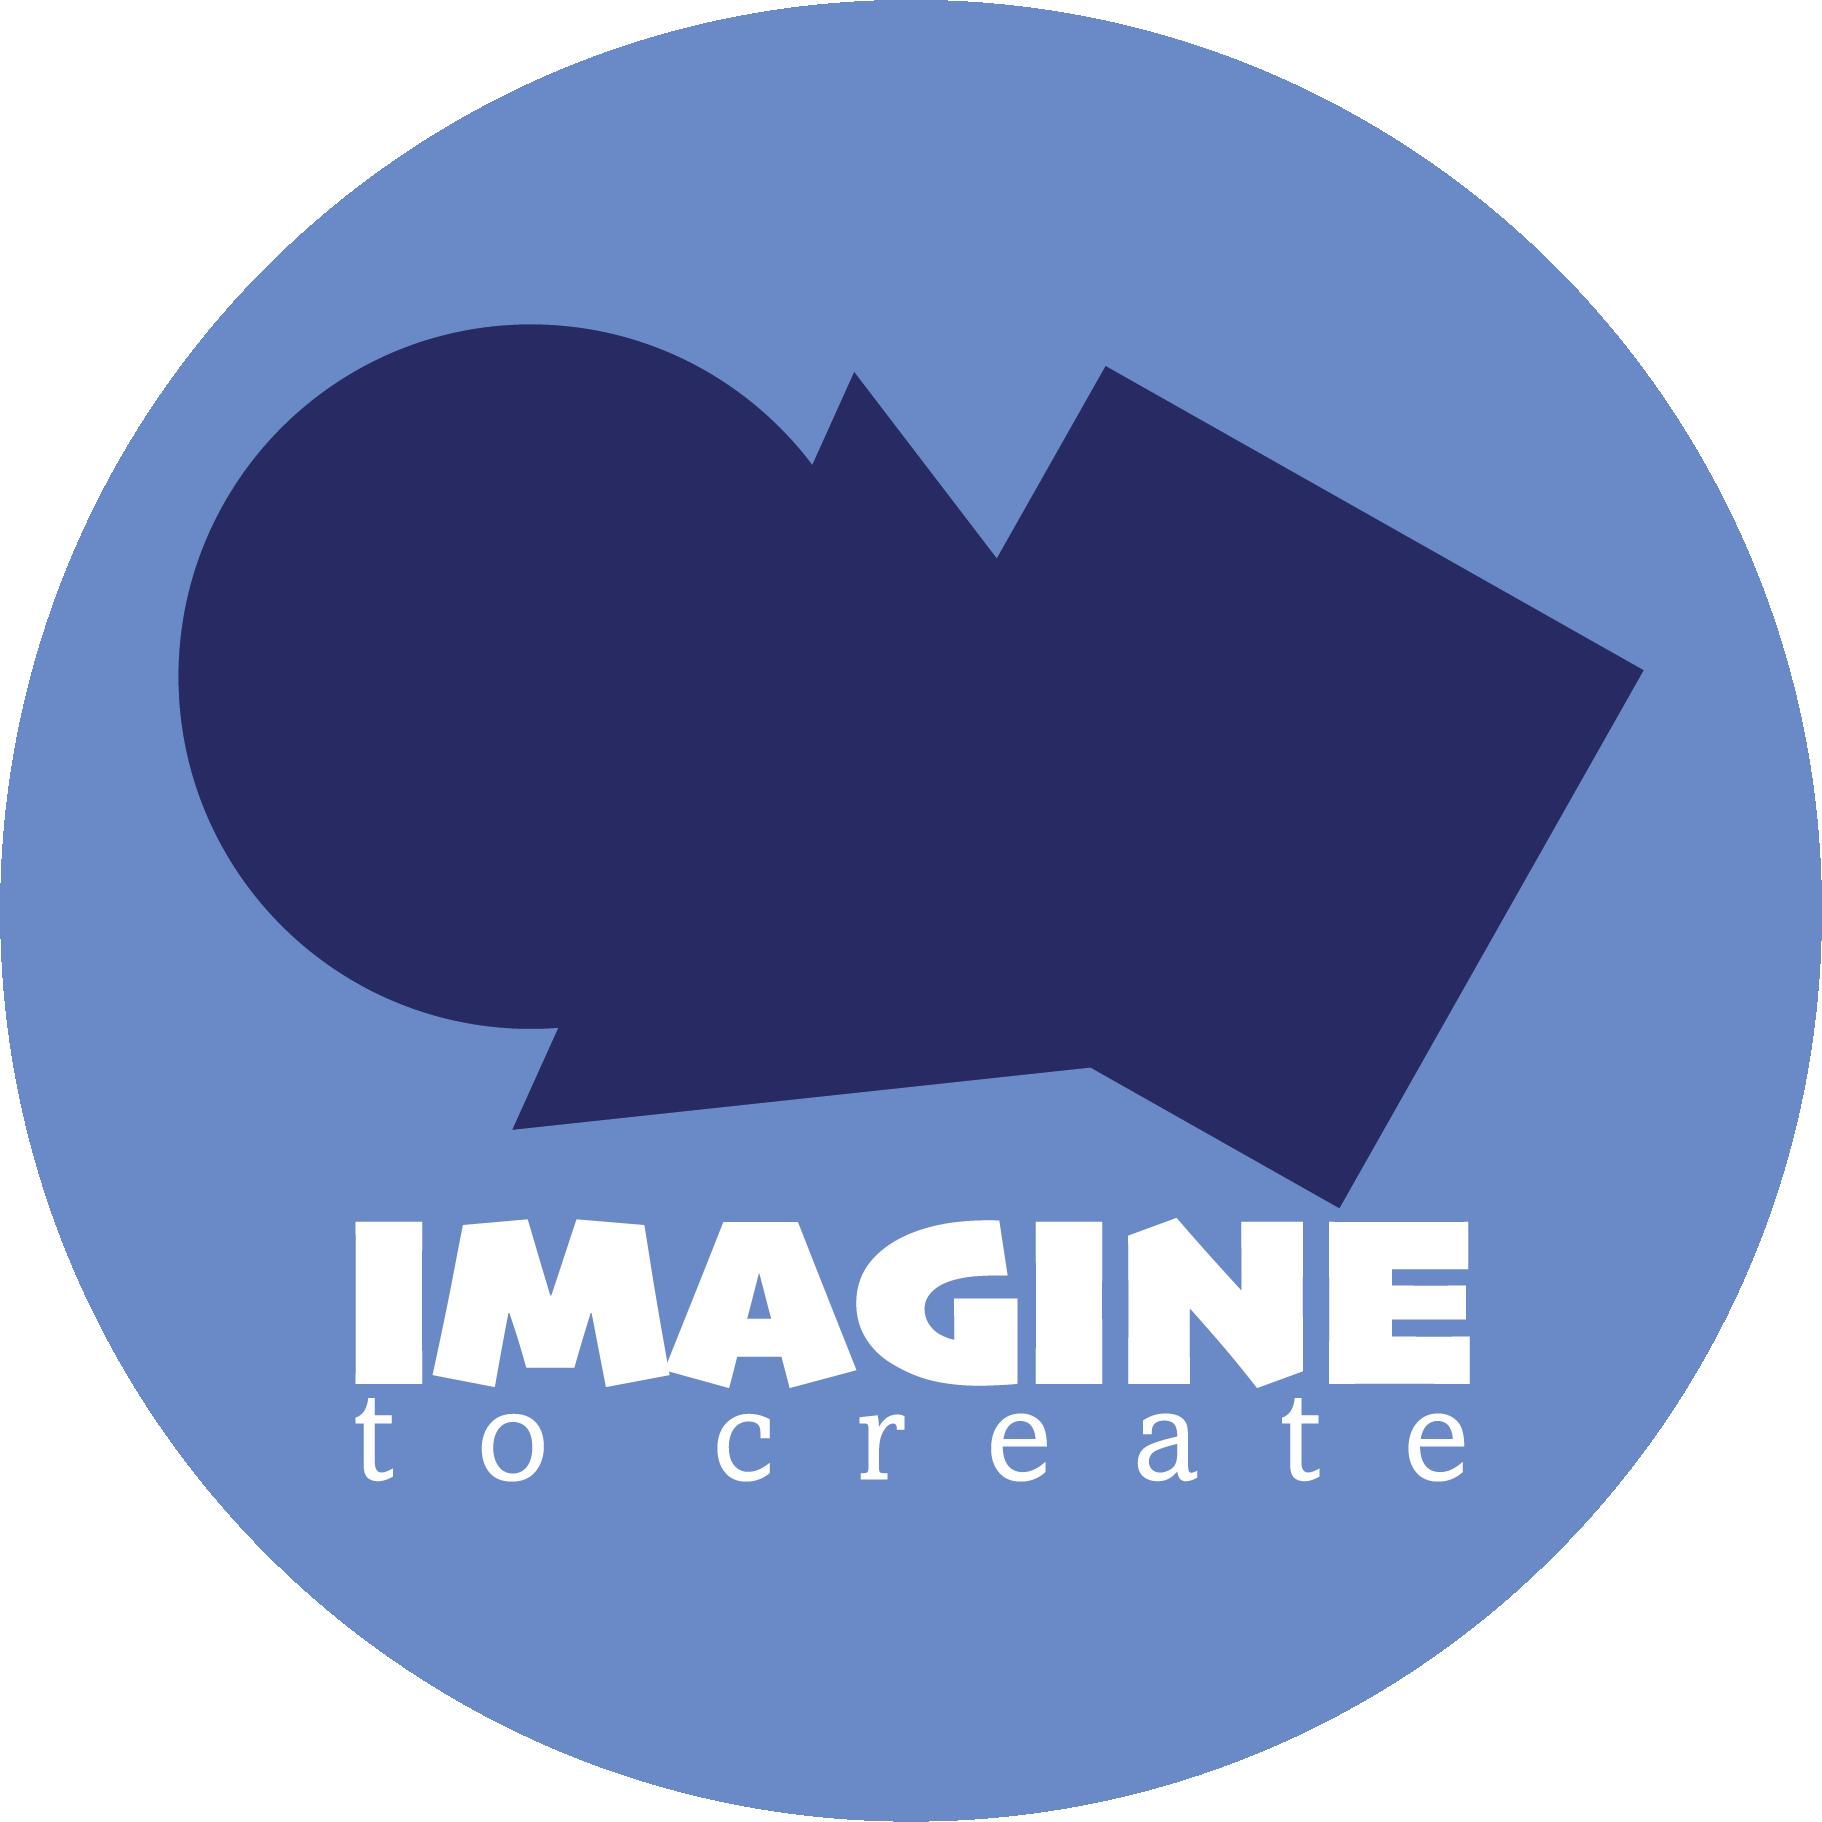 Imagine to Create